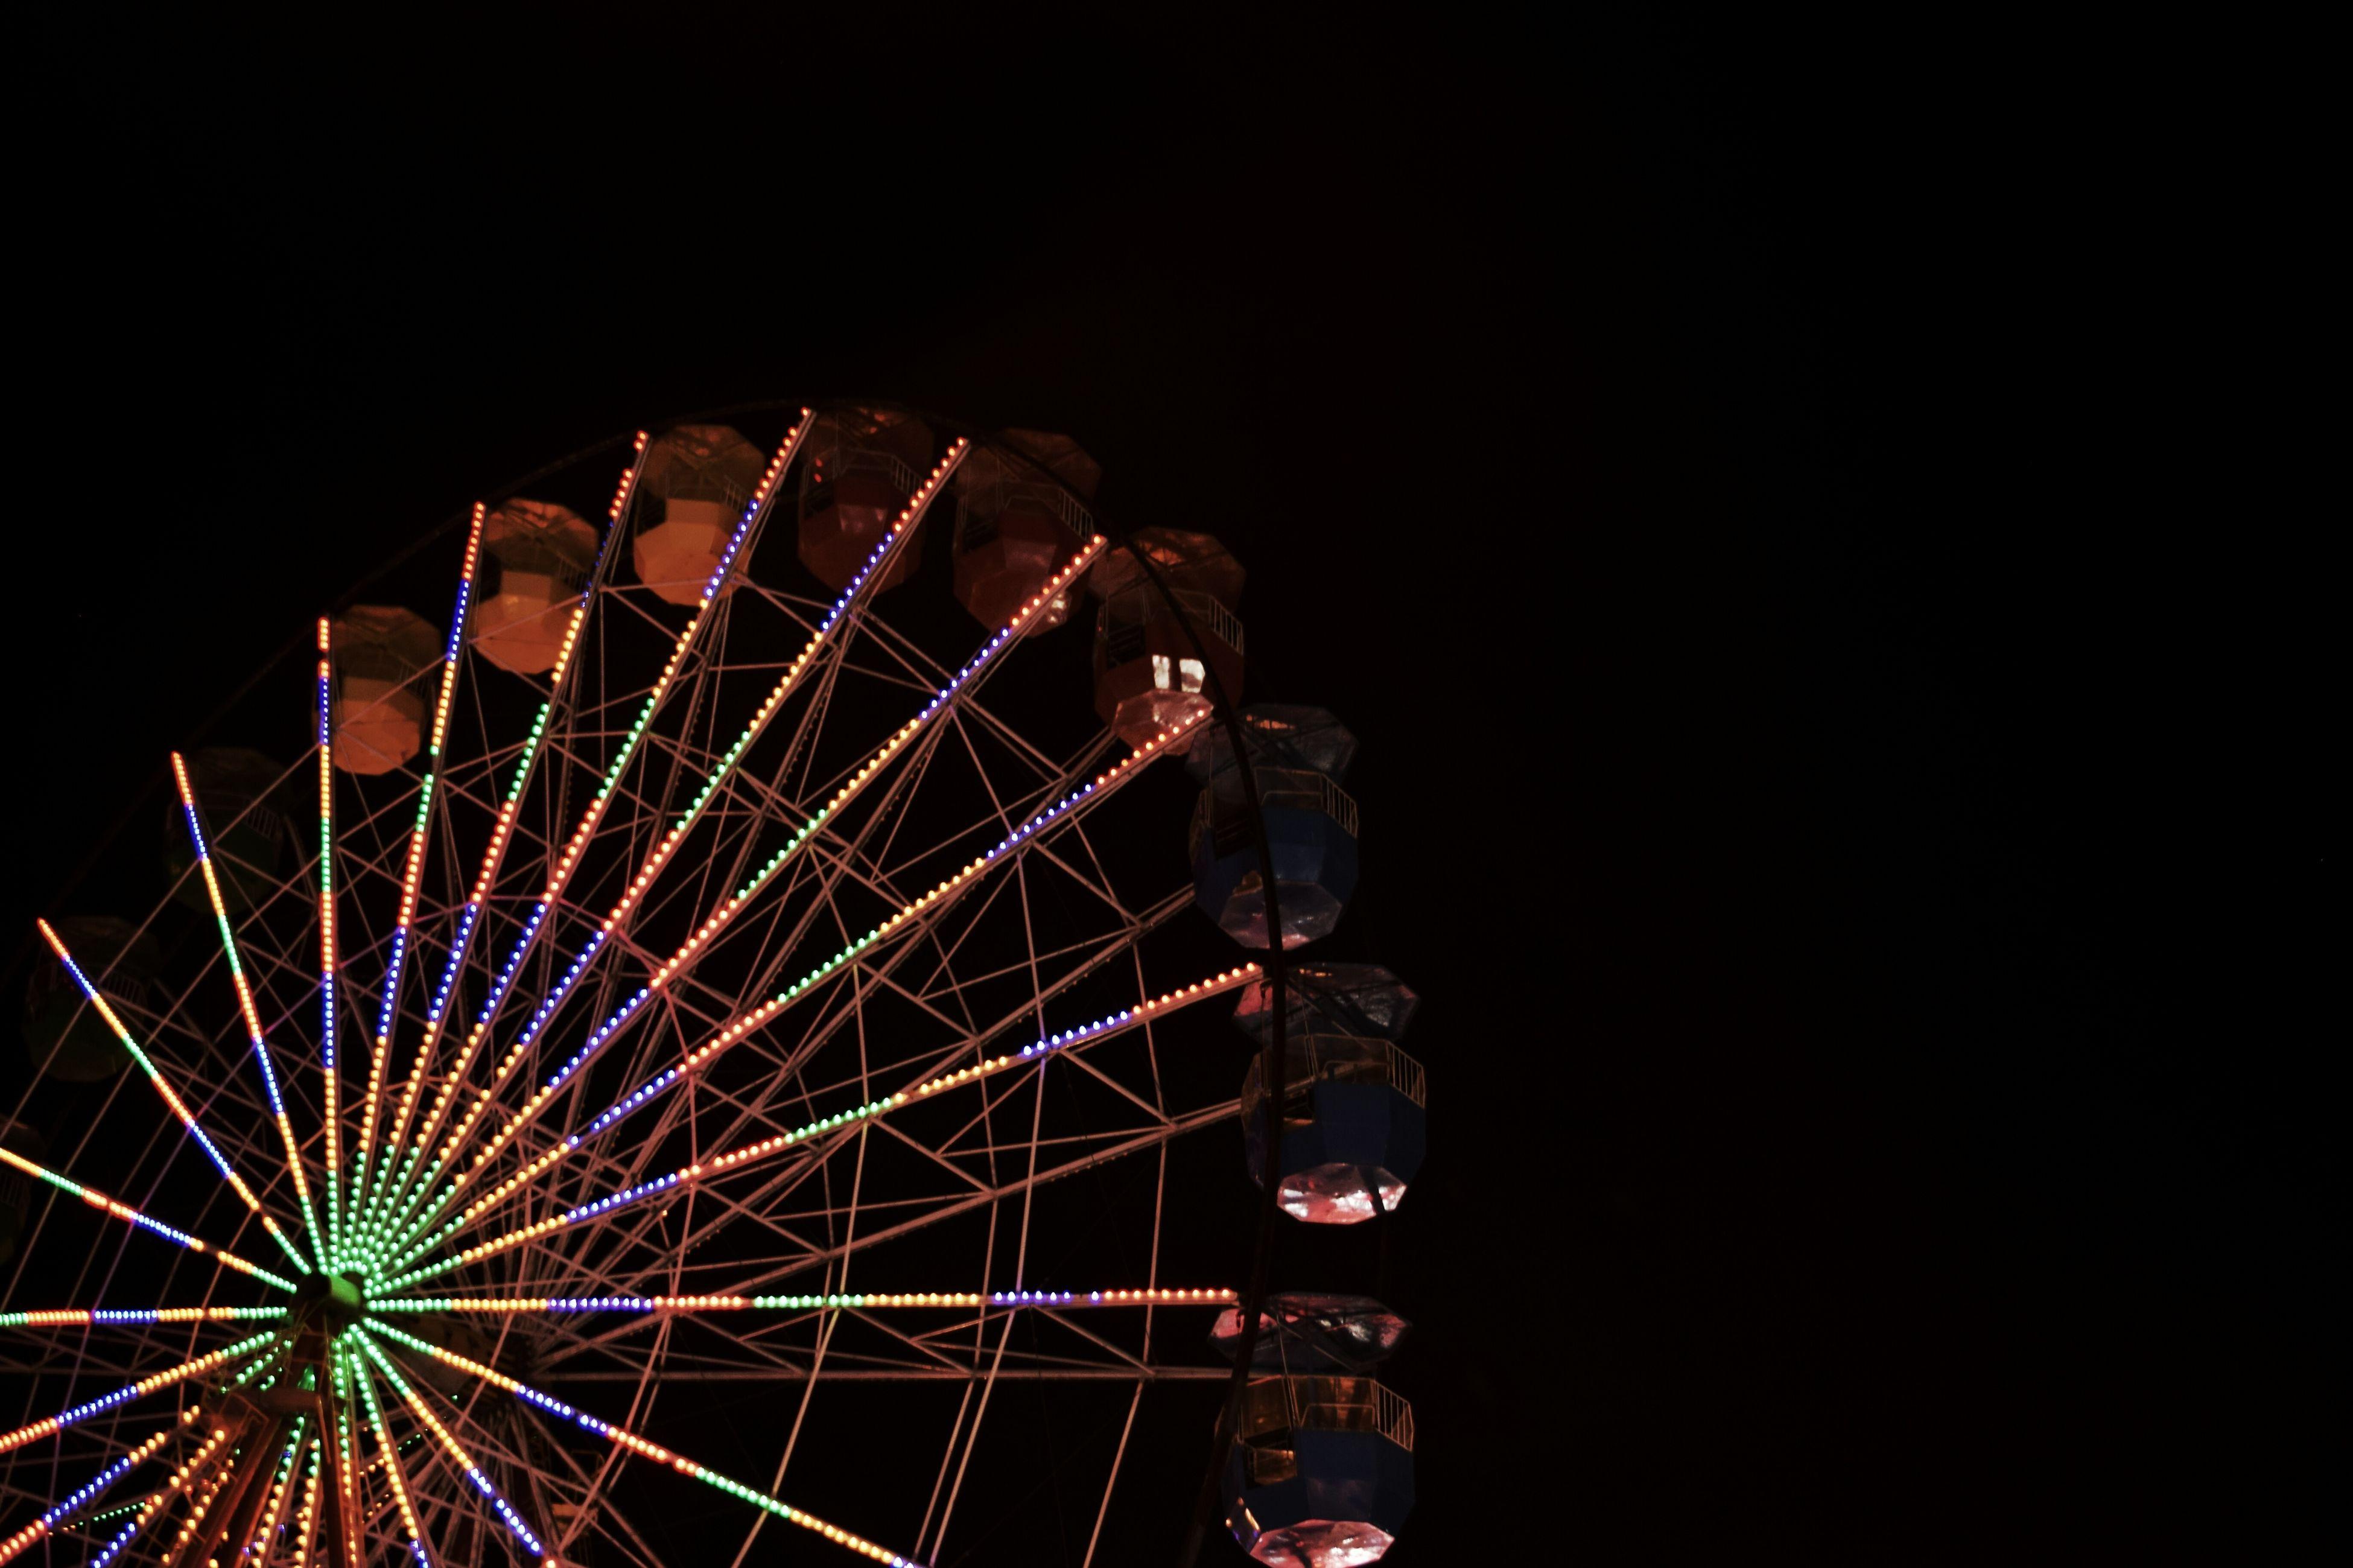 Ferris Wheel Ferriswheel Amusementpark Amusememt Park Night Nightphotography Night Photography Minimal Minimalism Minimalist Minimalistic شهربازی چرخ_و_فلک